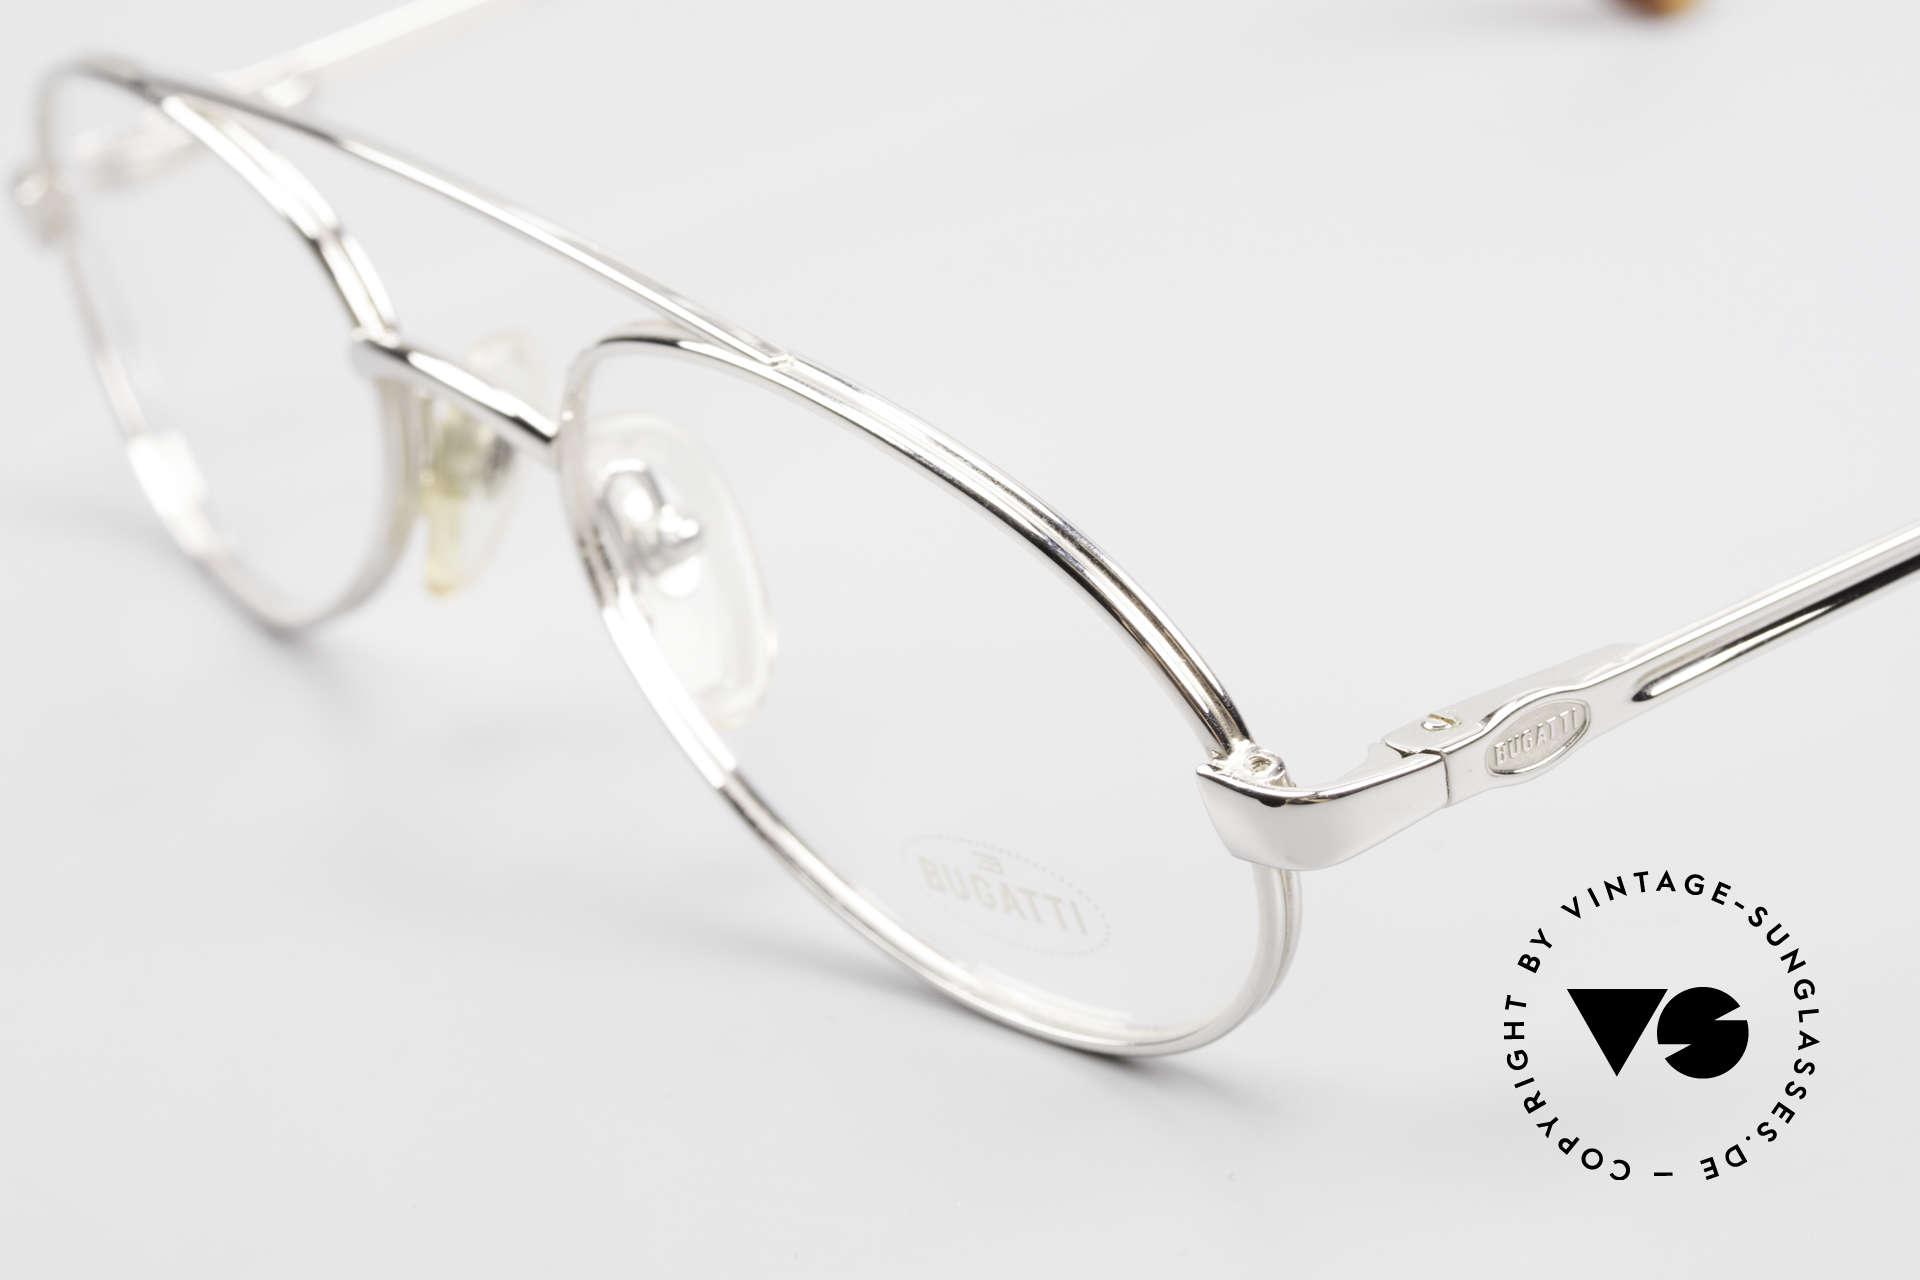 Bugatti 08104 Men's Vintage 80's Eyeglasses, still unworn (like all our vintage Bugatti eyewear), Made for Men